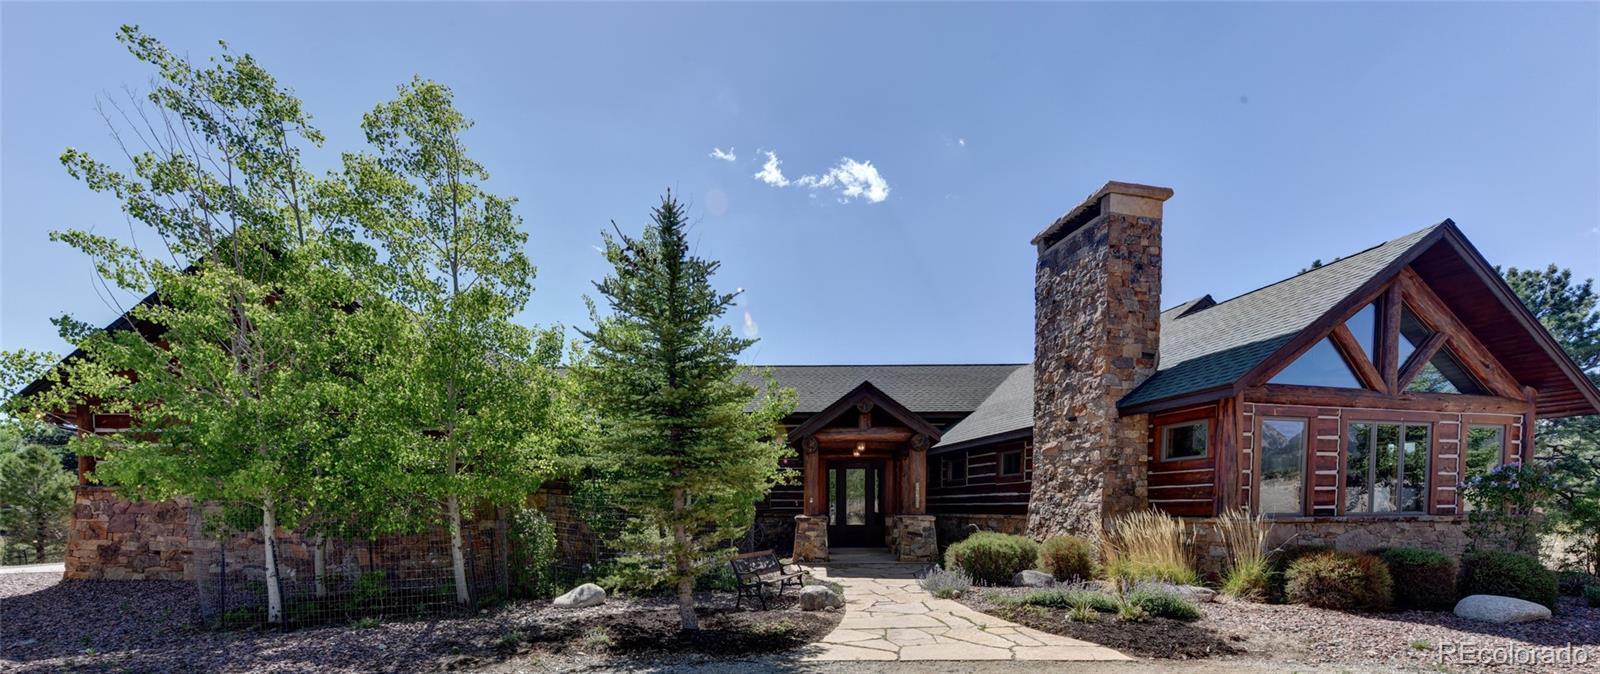 17431 Reserve Drive Property Photo - Buena Vista, CO real estate listing